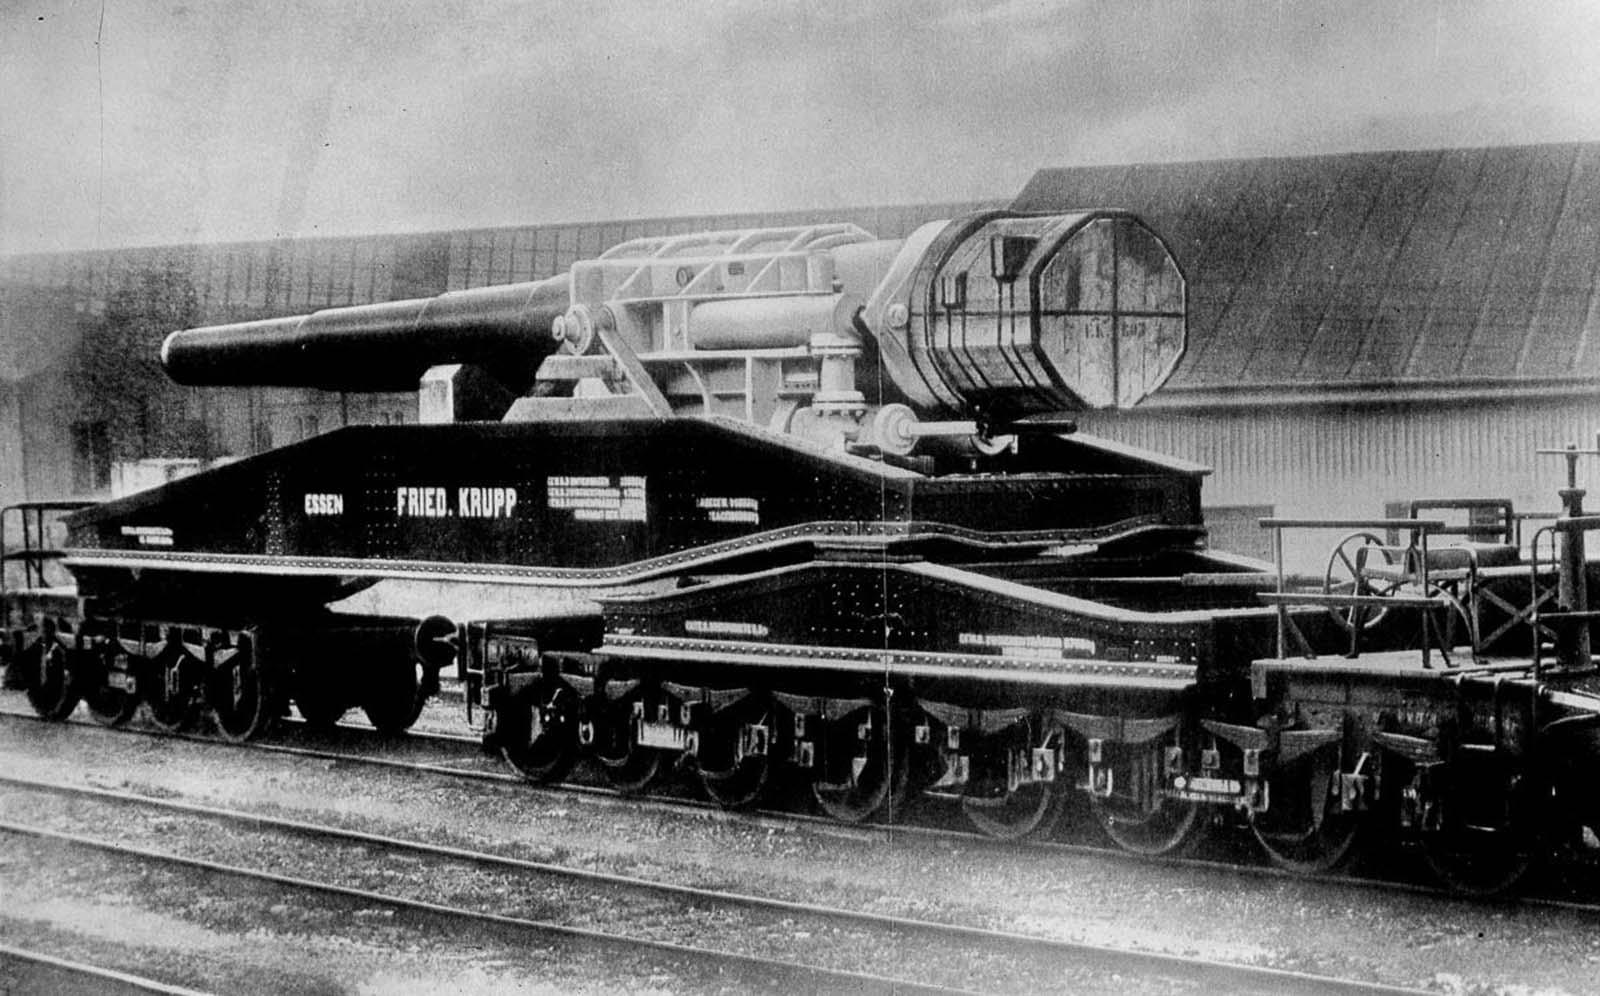 A Krupp 42 cannon on a flat wagon. 1916.